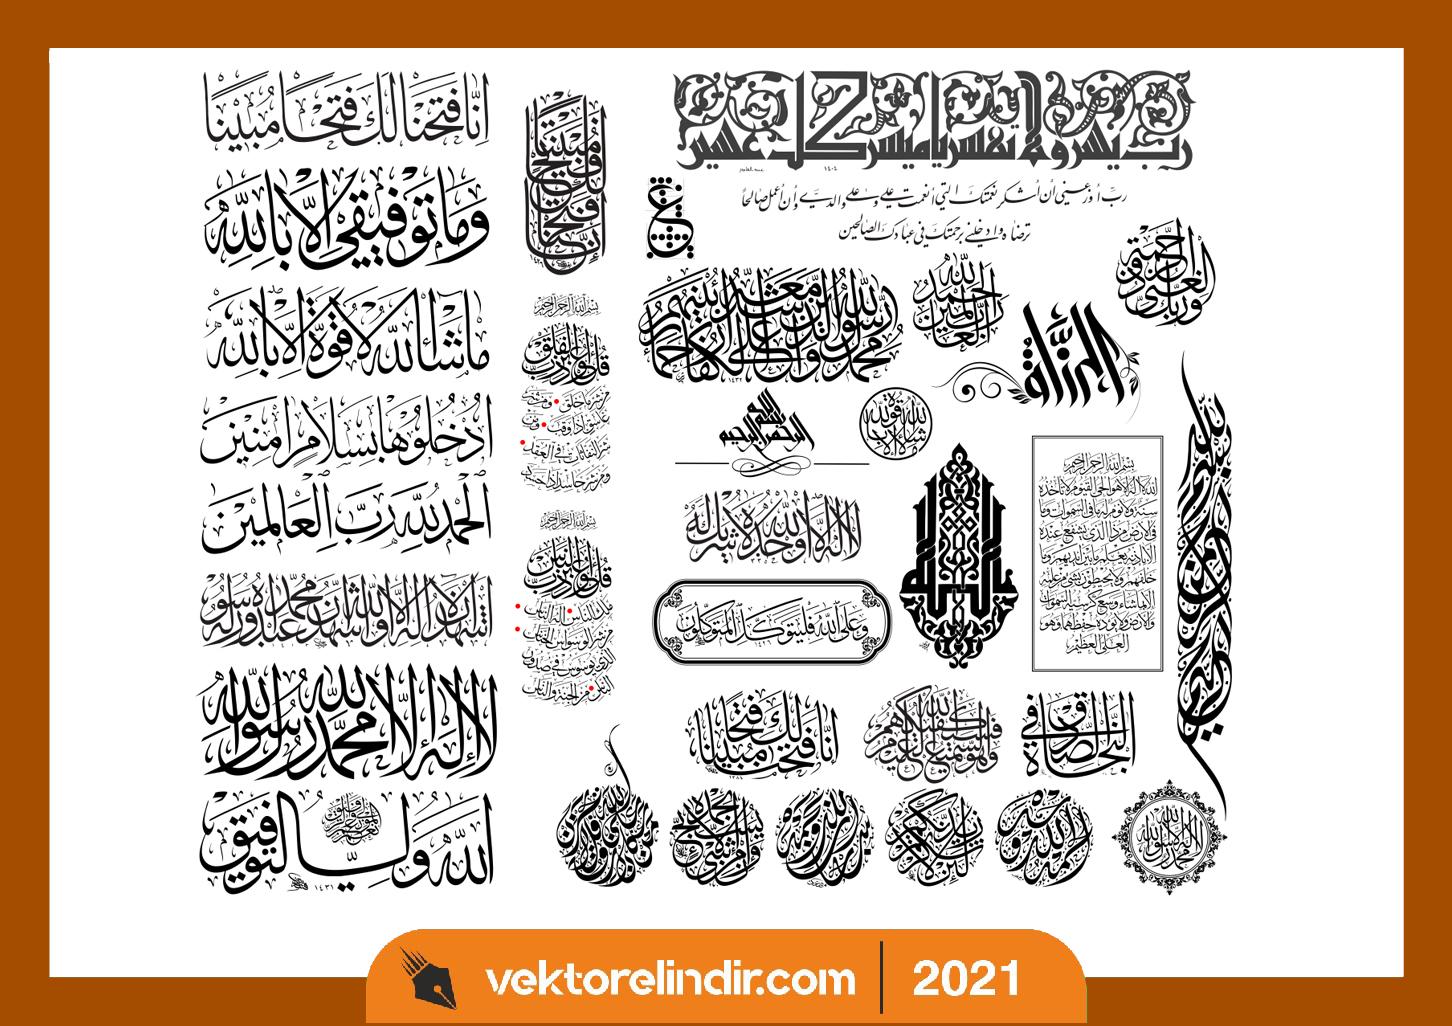 arapca-vektorel-besmele-allah-islami-3